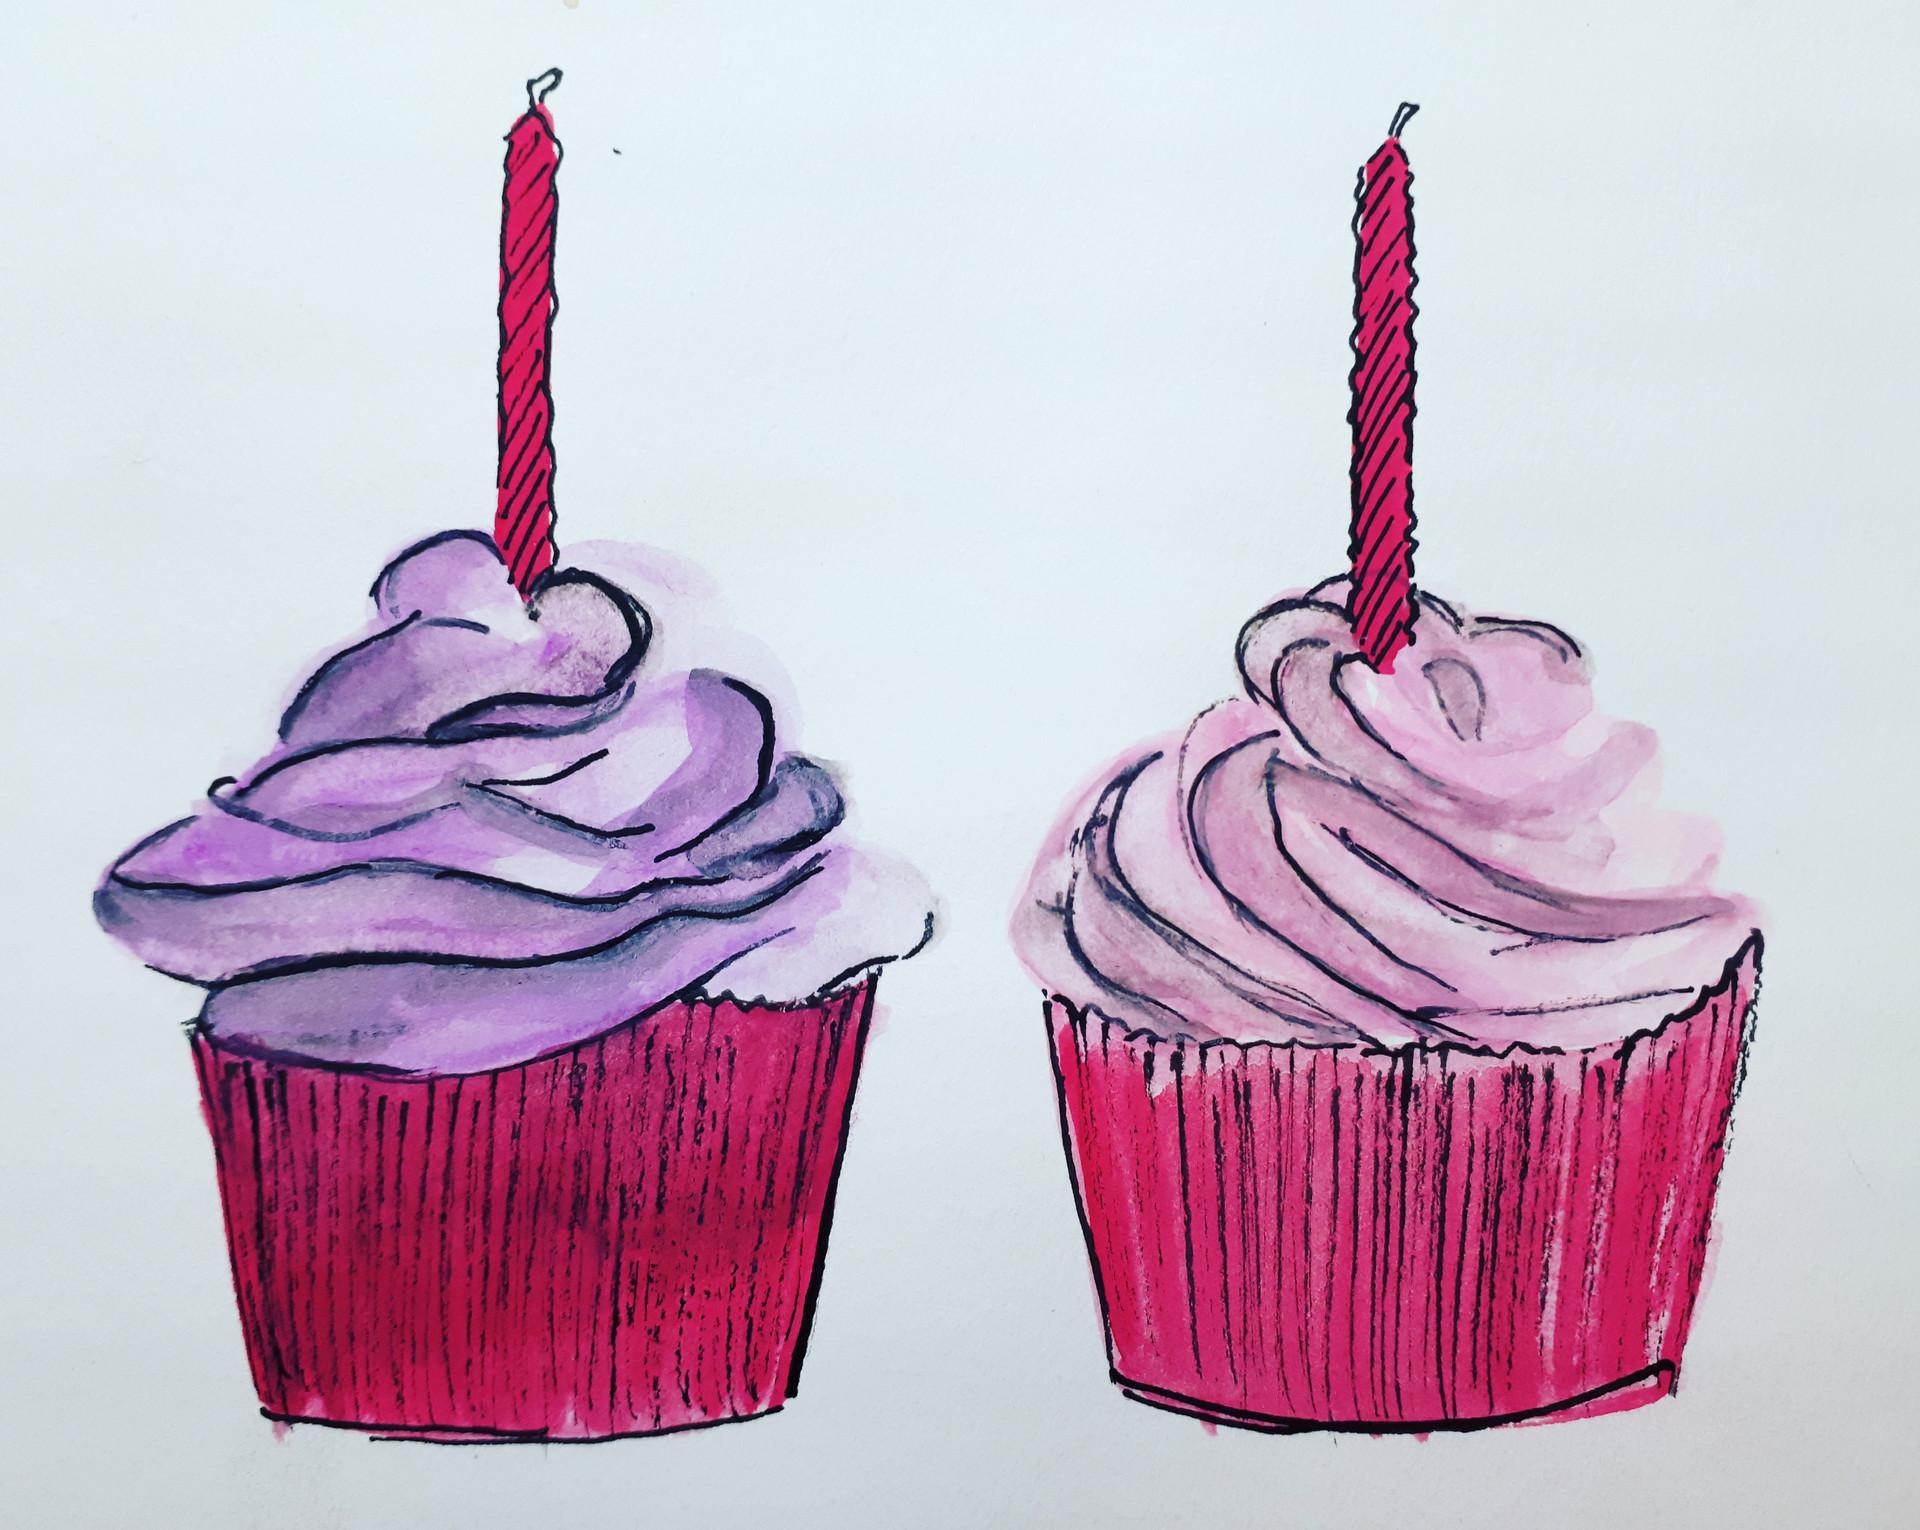 'Cupcakes', 2017.